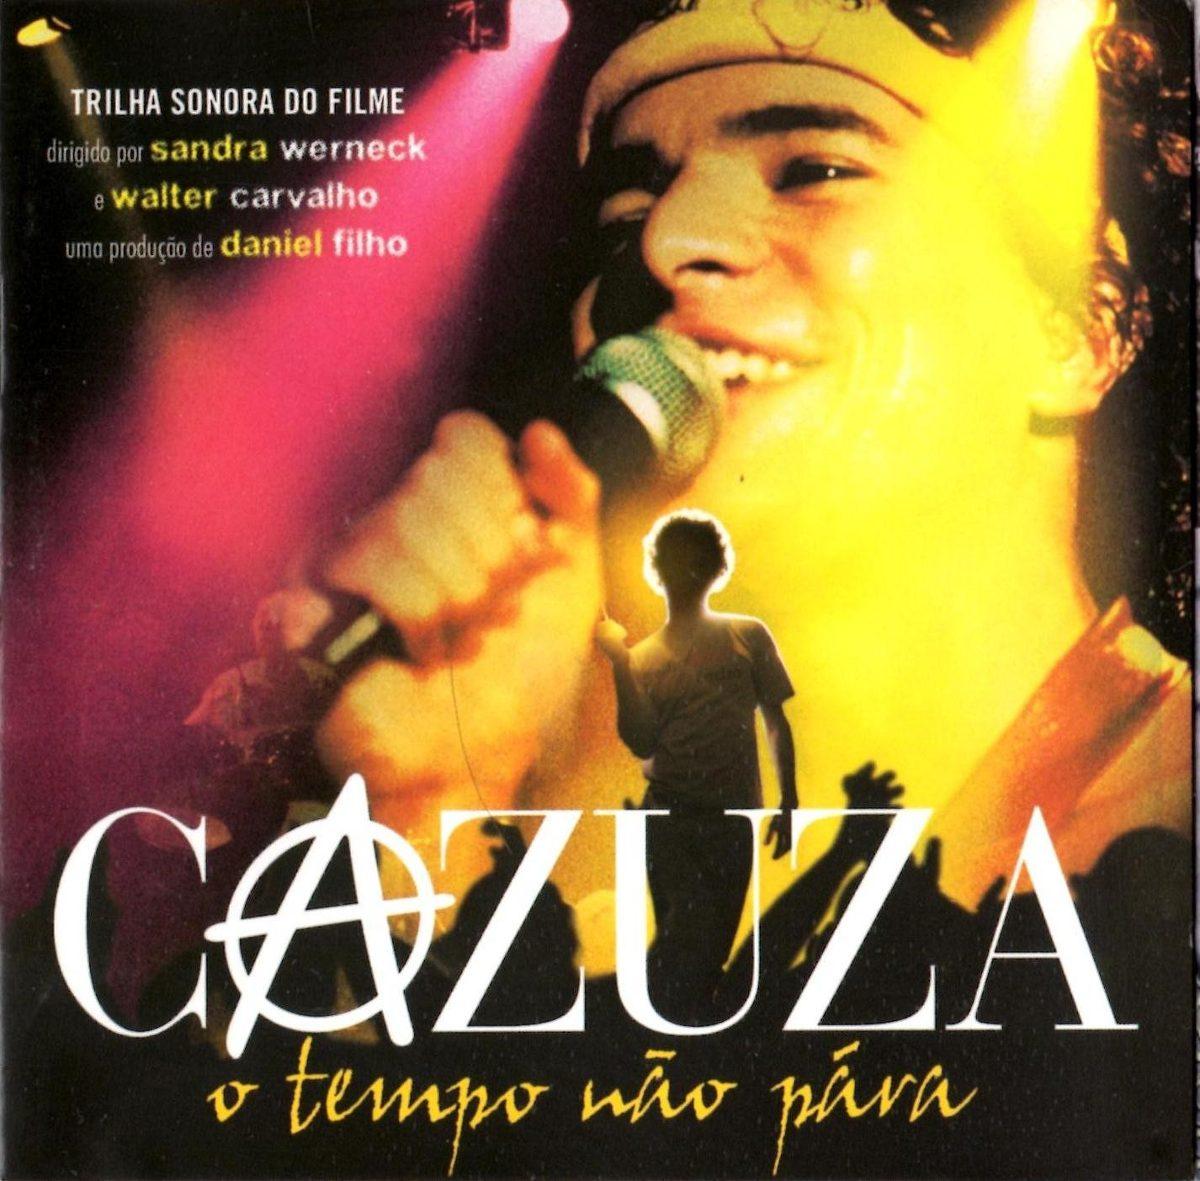 FILME BAIXAR SONORA CAZUZA TRILHA CD